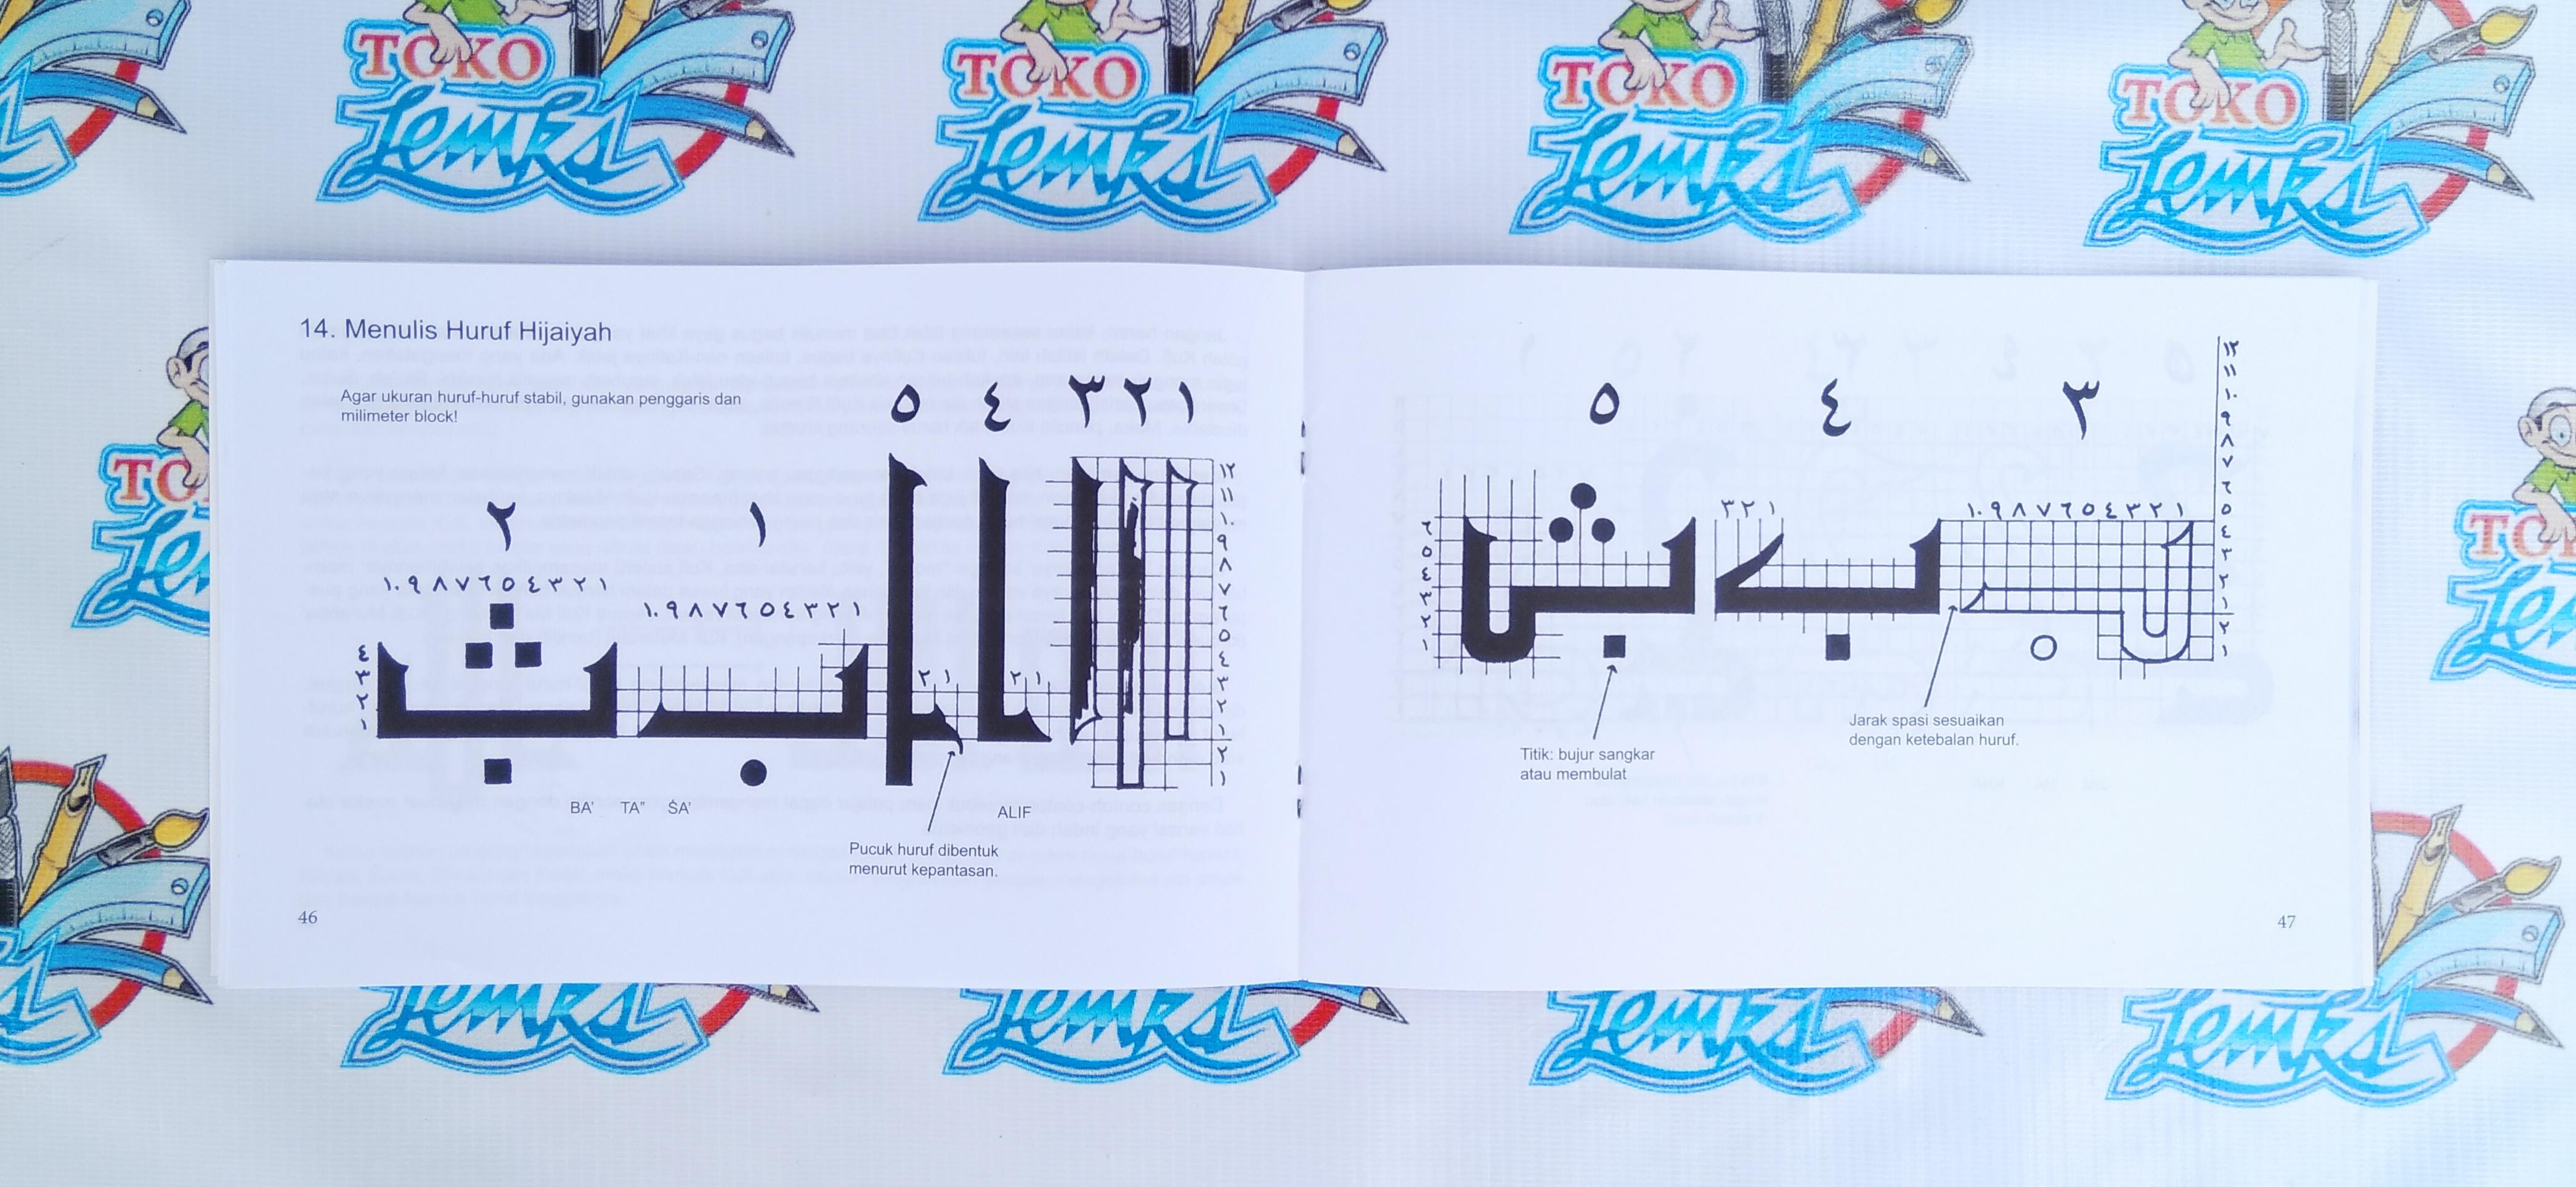 Huruf Hijaiyah Khat Kaligrafi Koleksigambar Site Buku Qoedah Kaligrafi Kaidah Kaligrafi Buku Kaligrafi Buku Belajar Kaligrafi Menulis